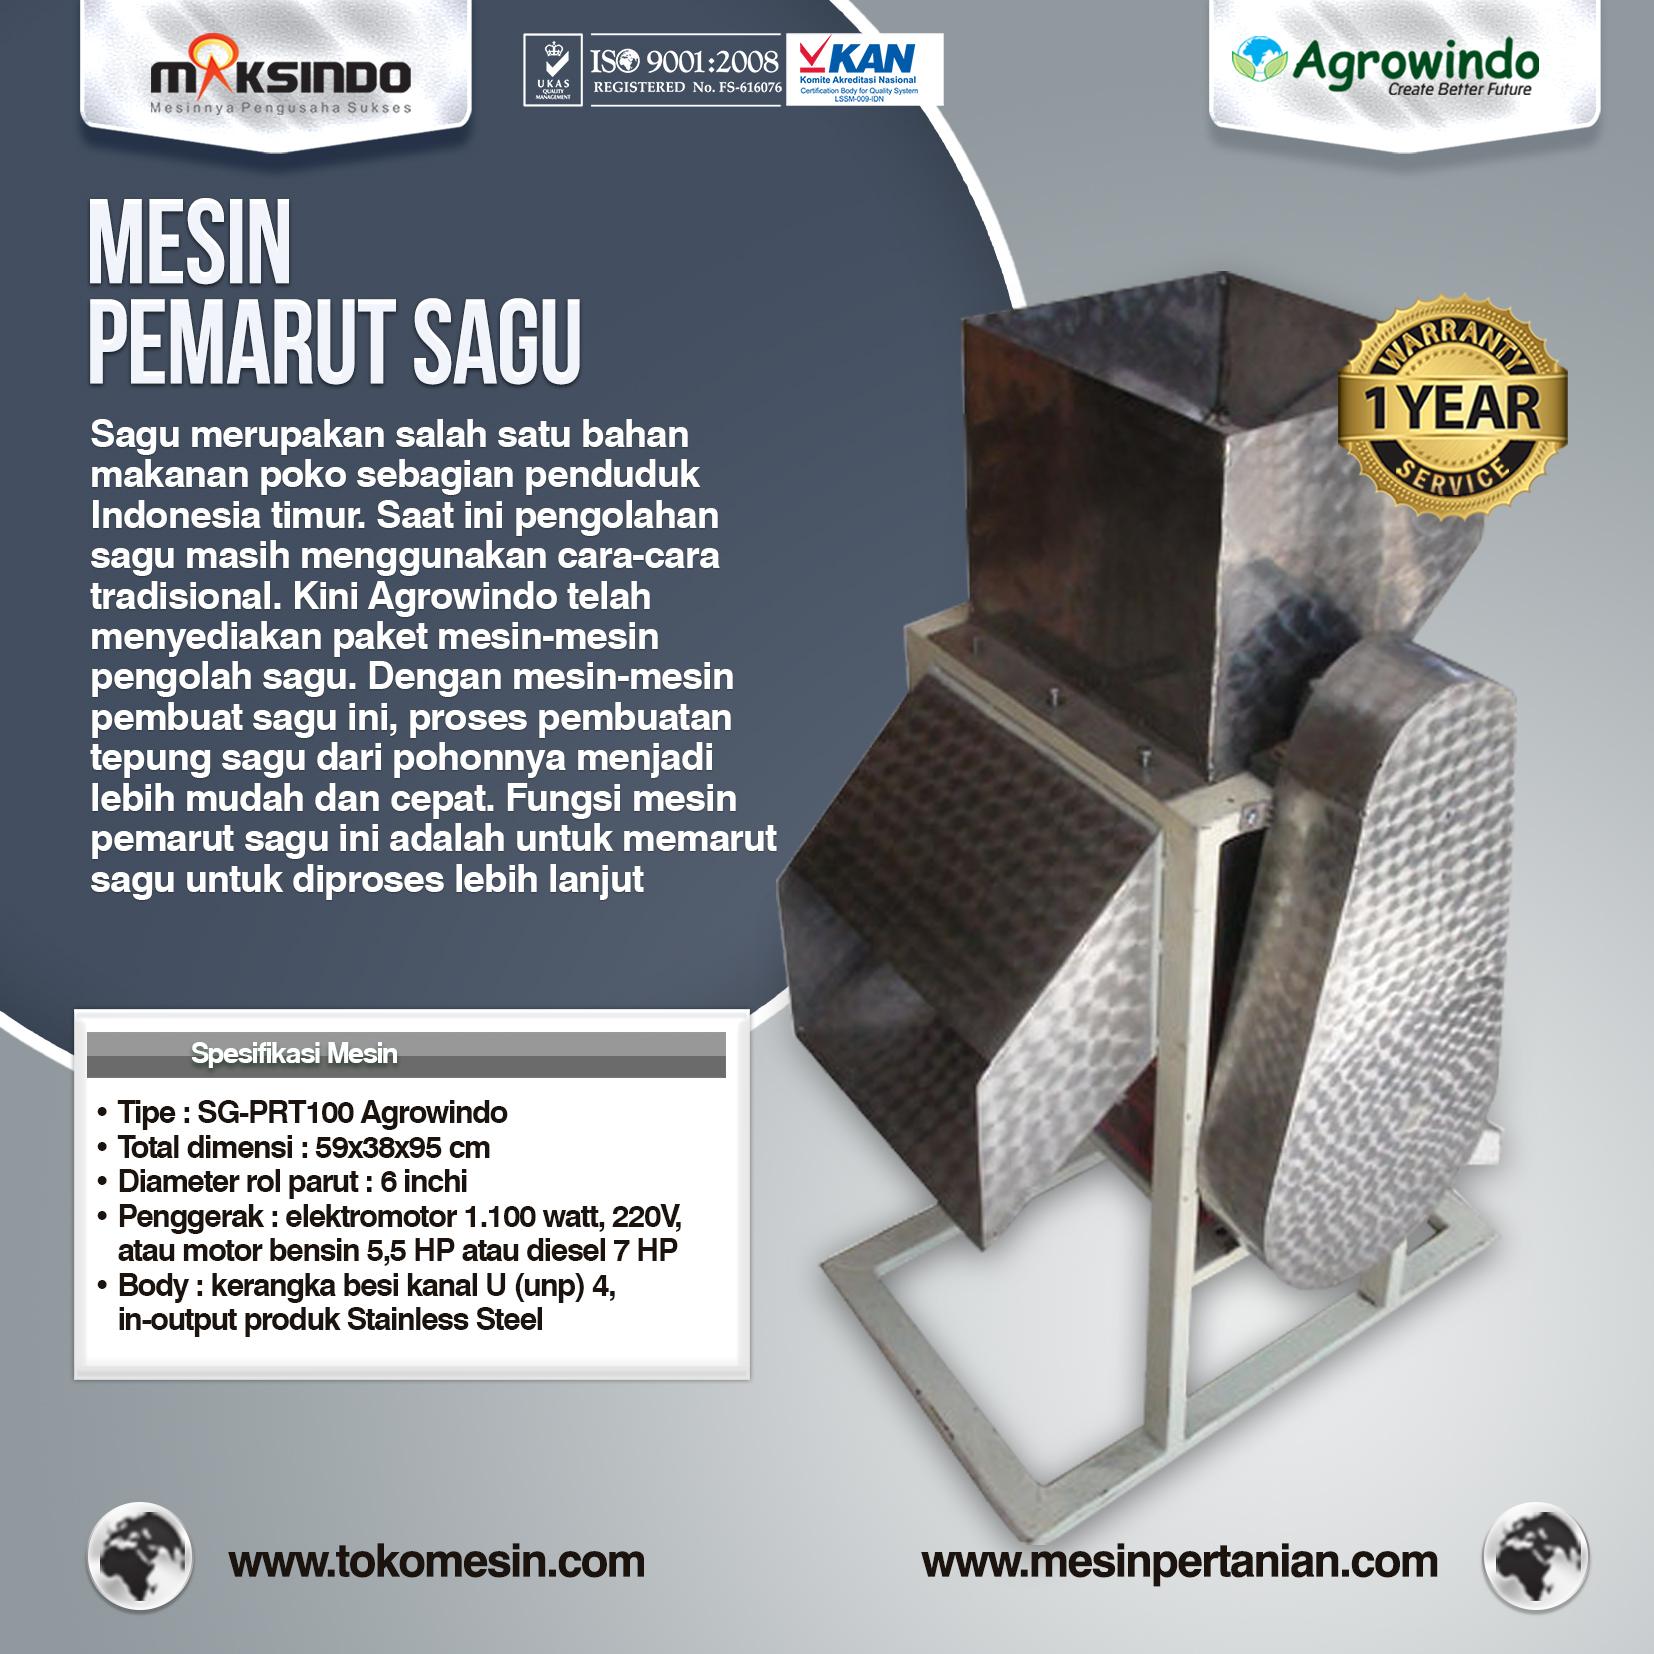 Mesin Pemarut Sagu SG-PRT100 Agrowindo